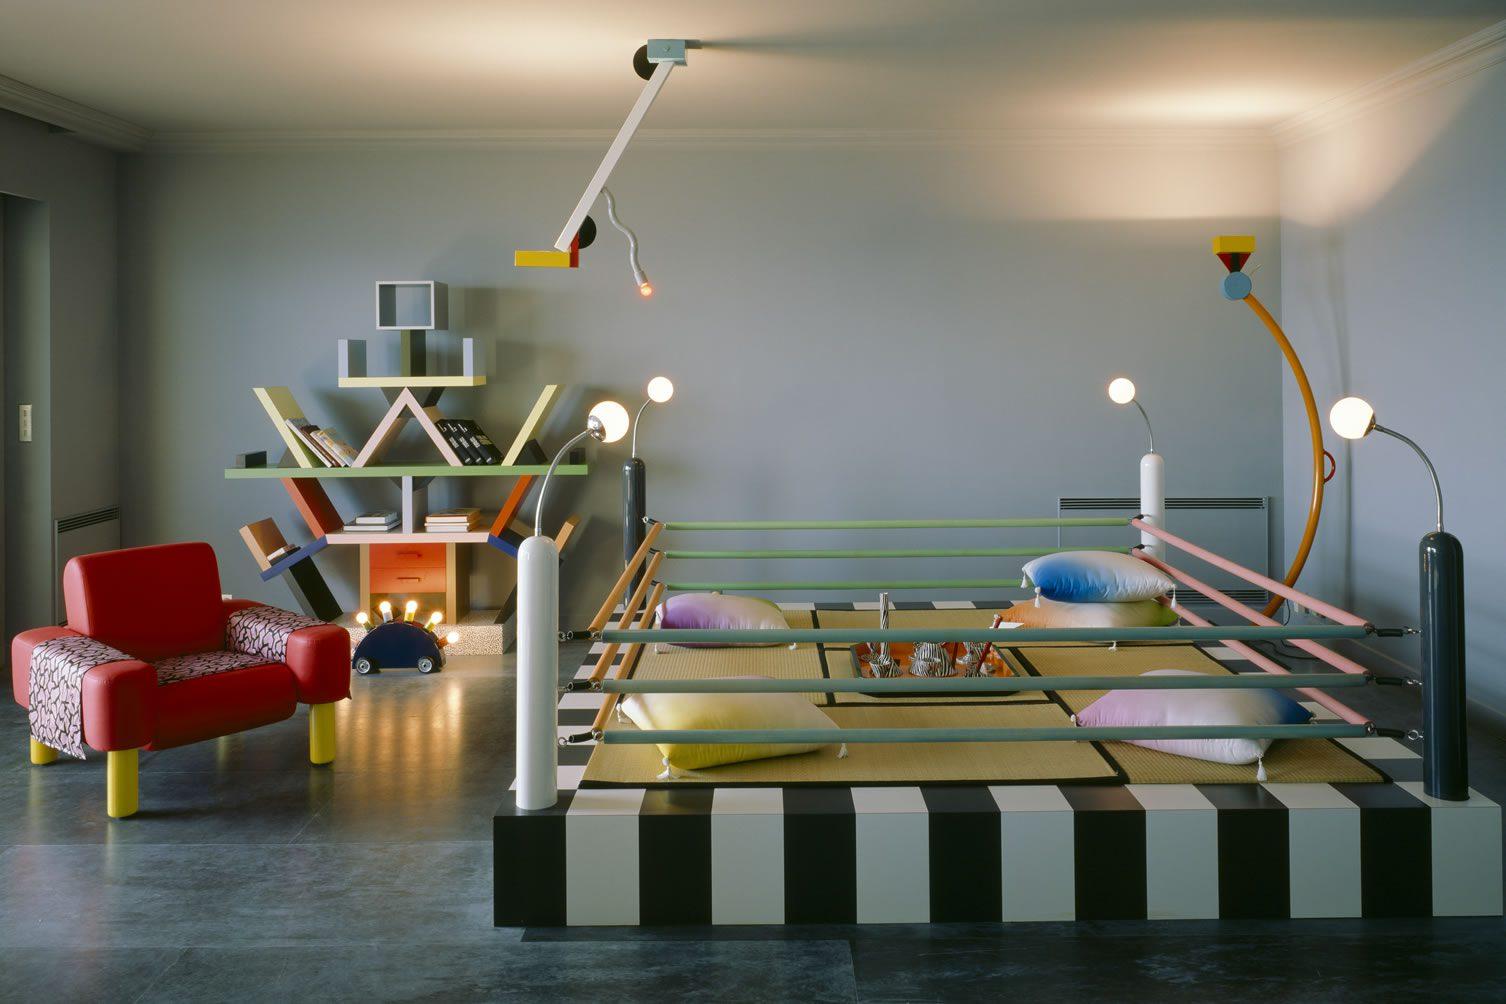 Karl Lagerfeld Memphis Apartment Monaco 1980s,Professional Background Facebook Cover Photo Design